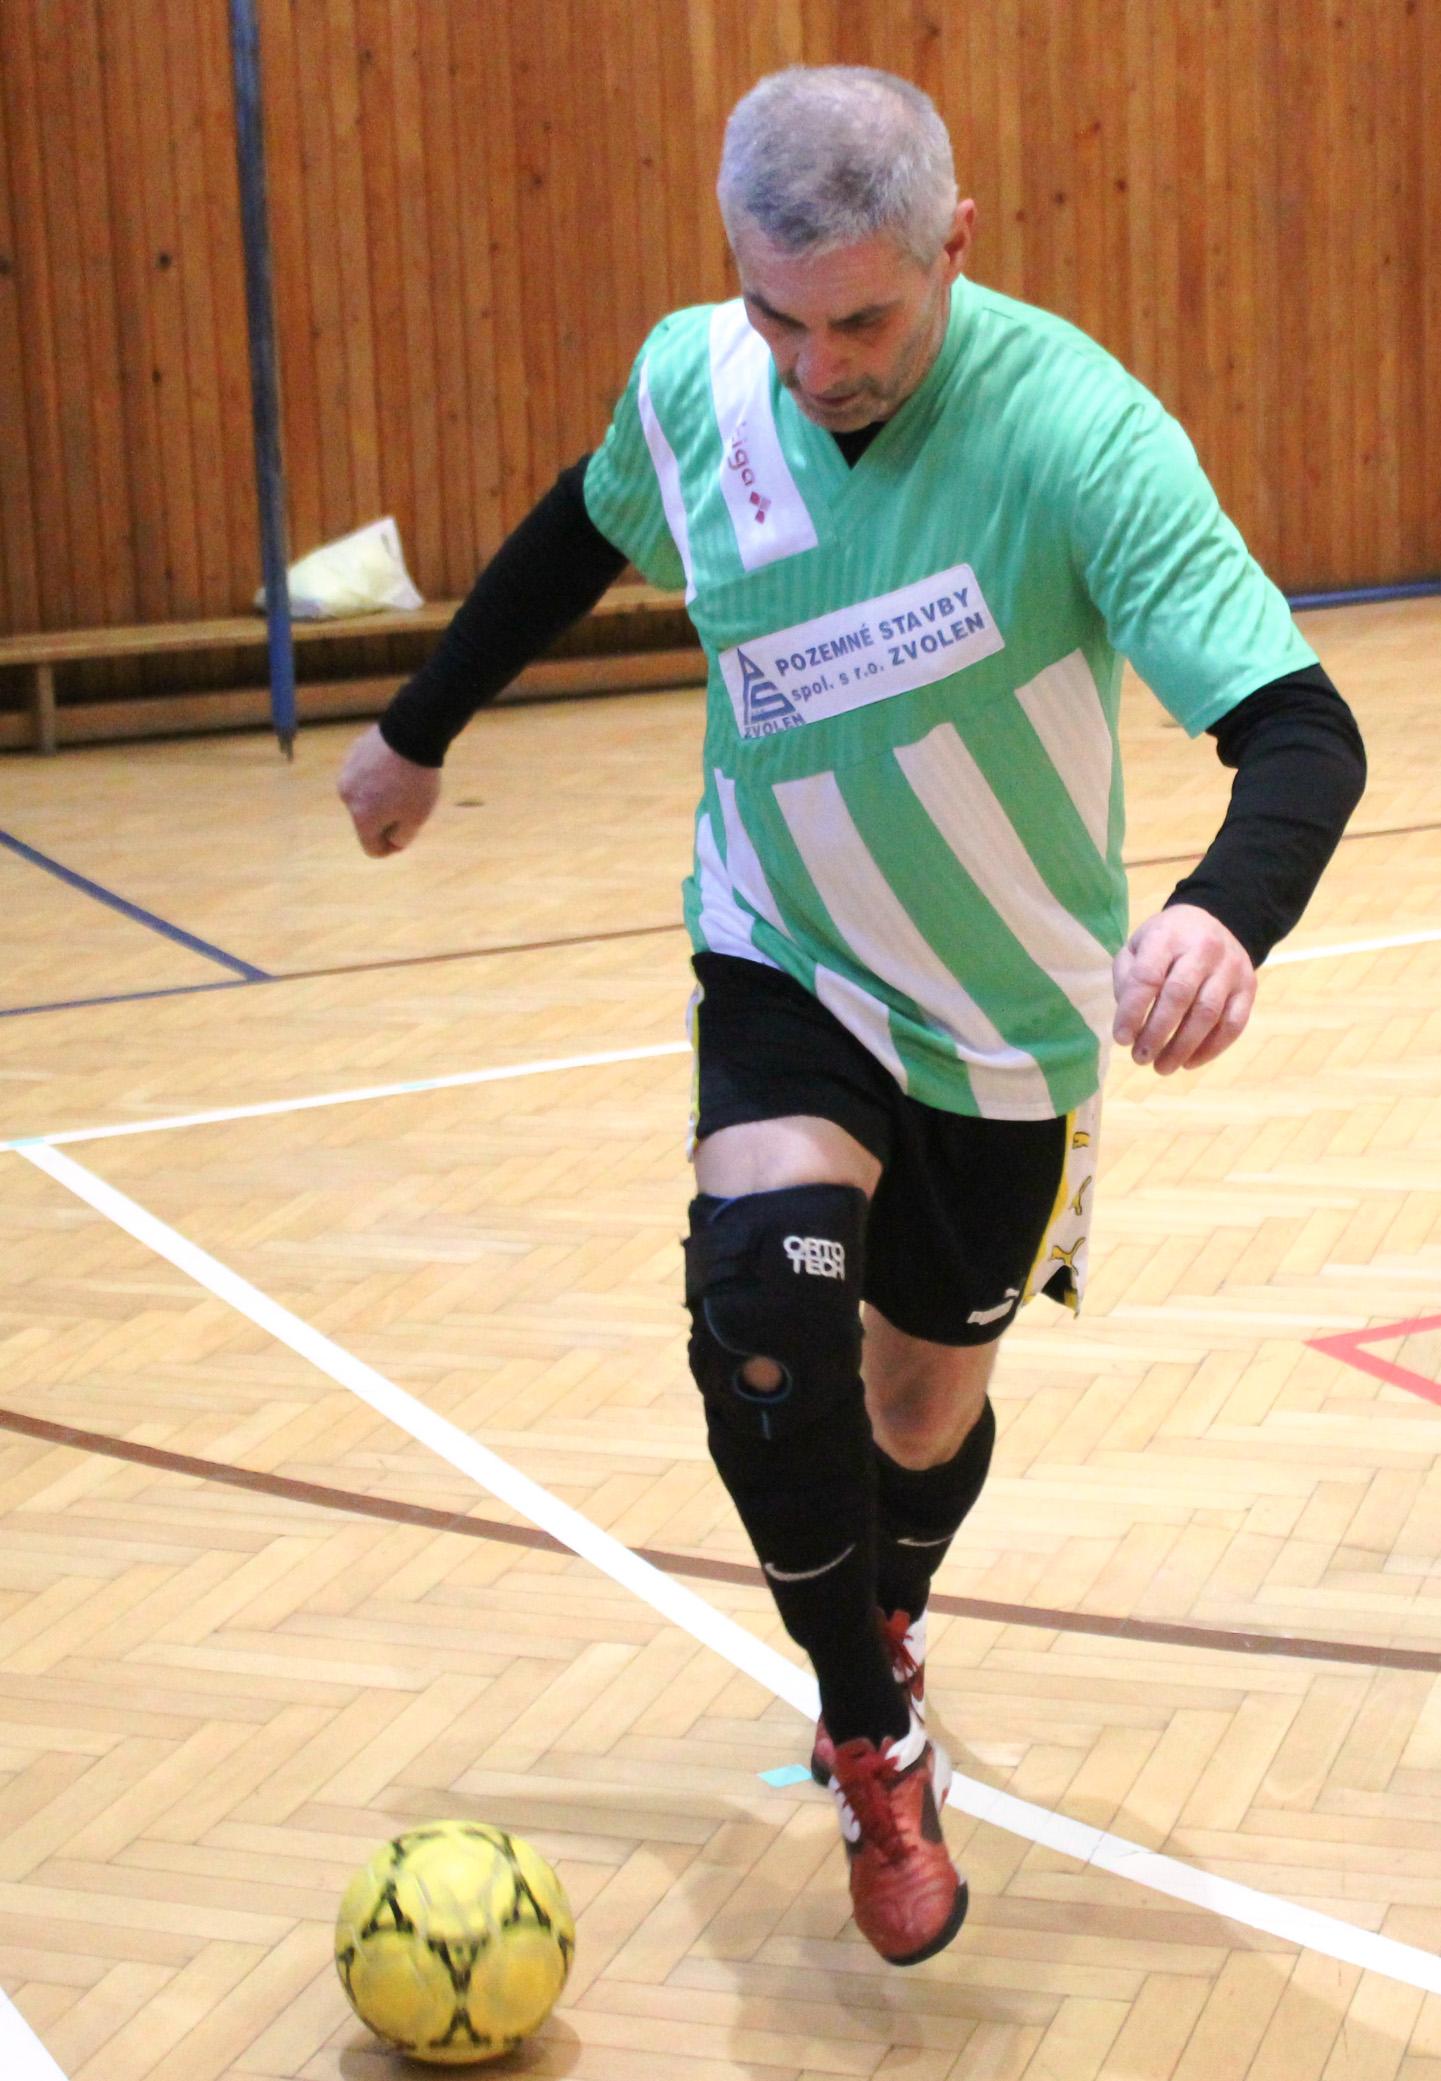 xanto-liga-40-2015-zvolen-10